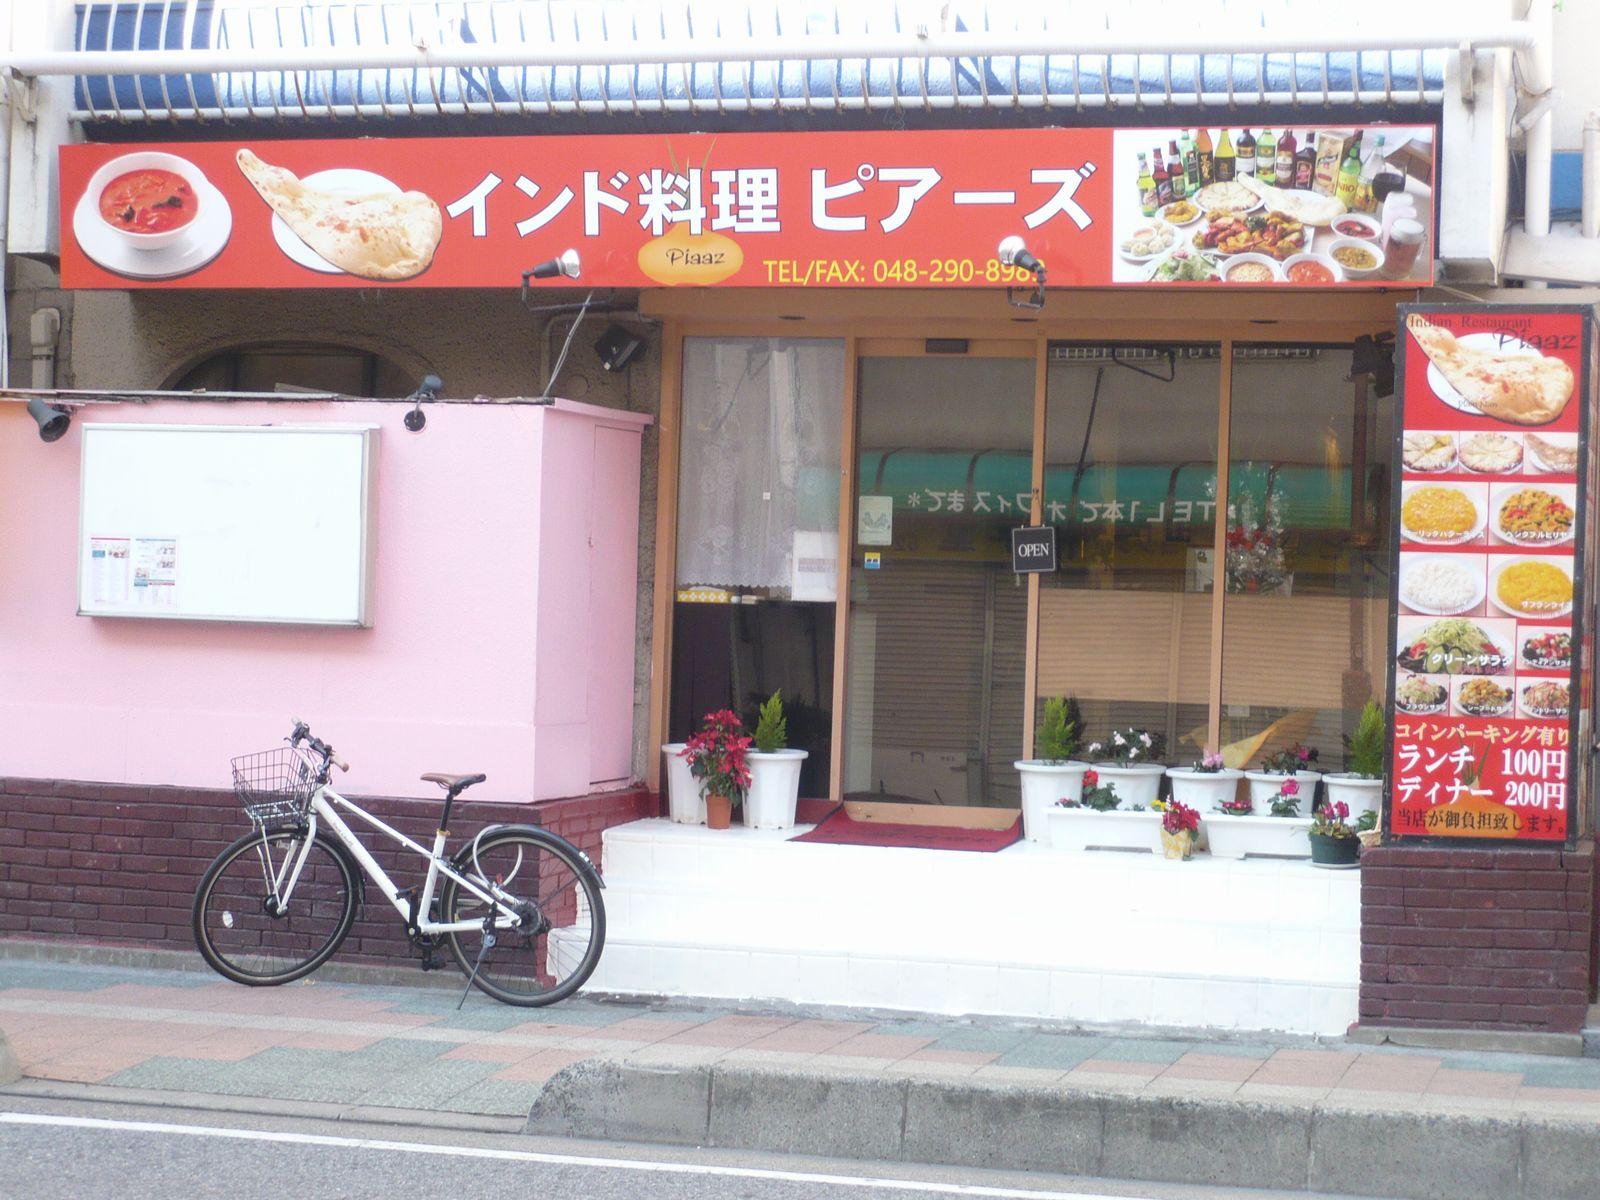 Piaaz 川口店